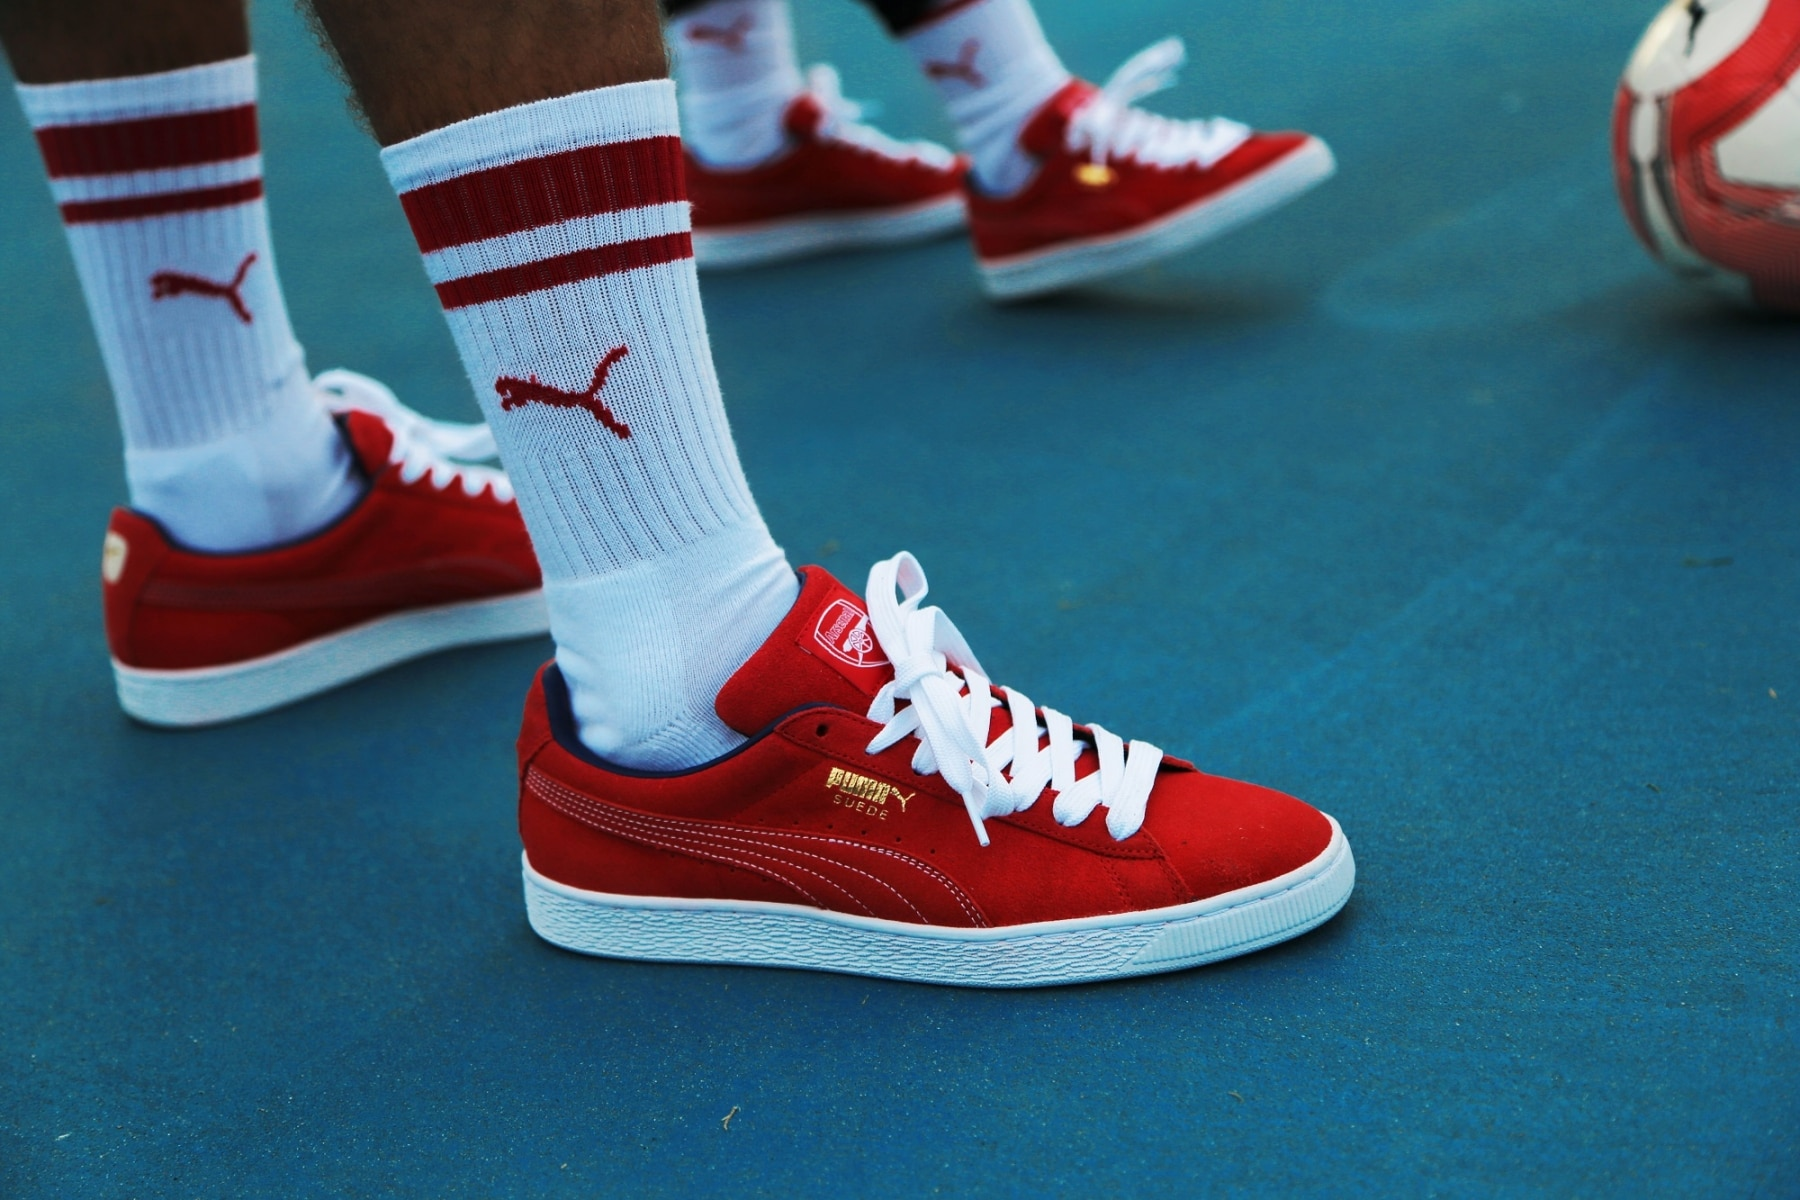 arsenal puma sneakers